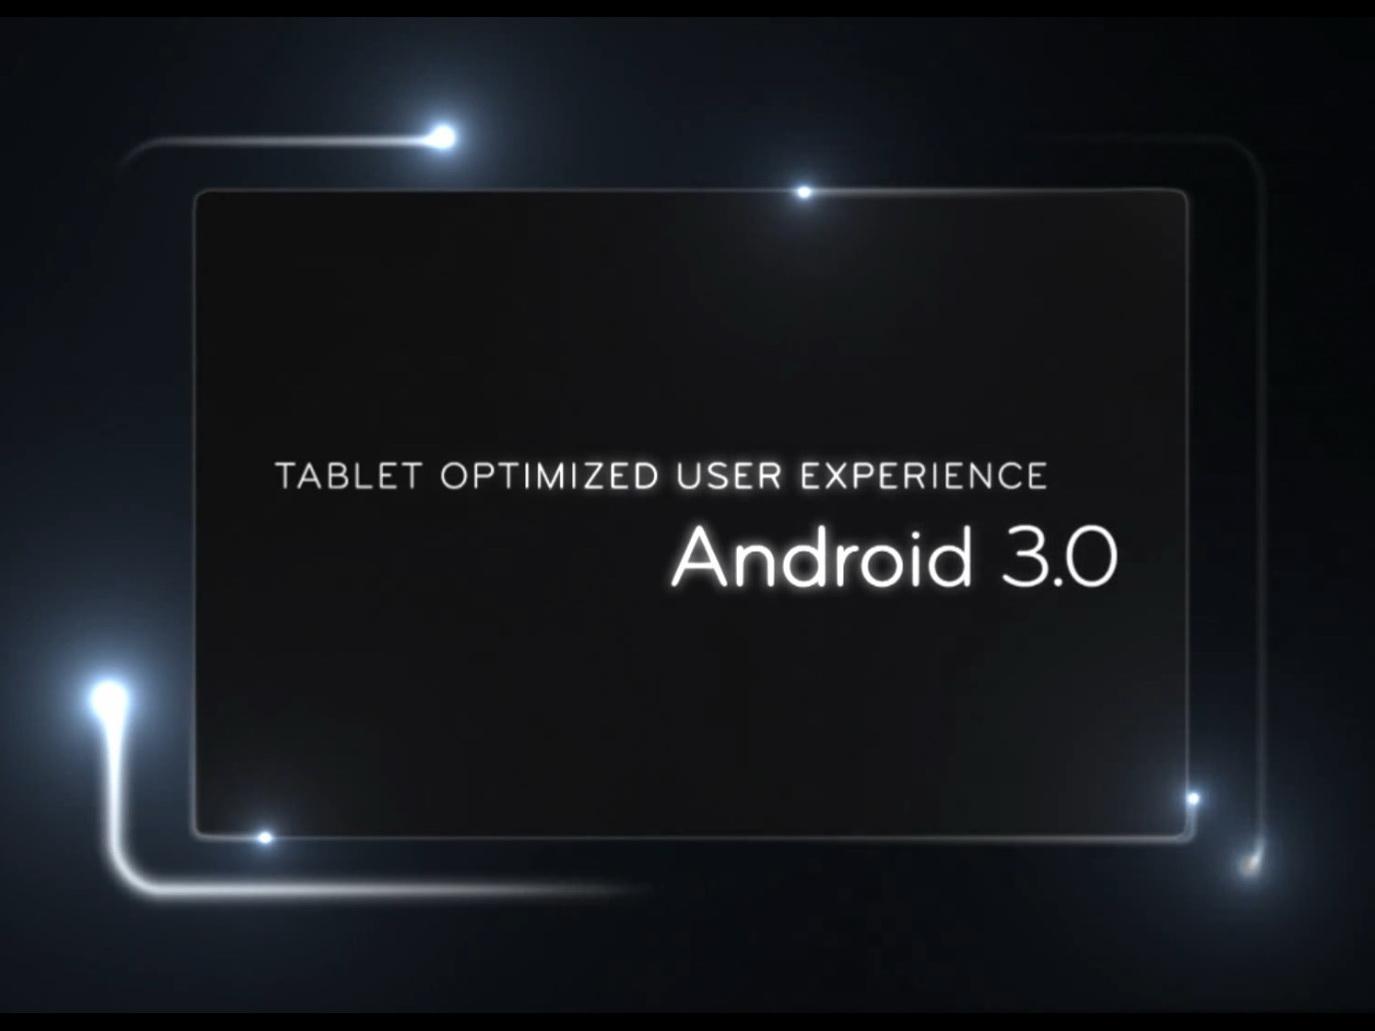 ces 2011 t mobile usa und lg k ndigen t mobile g slate mit 4g und android 3 0 an. Black Bedroom Furniture Sets. Home Design Ideas